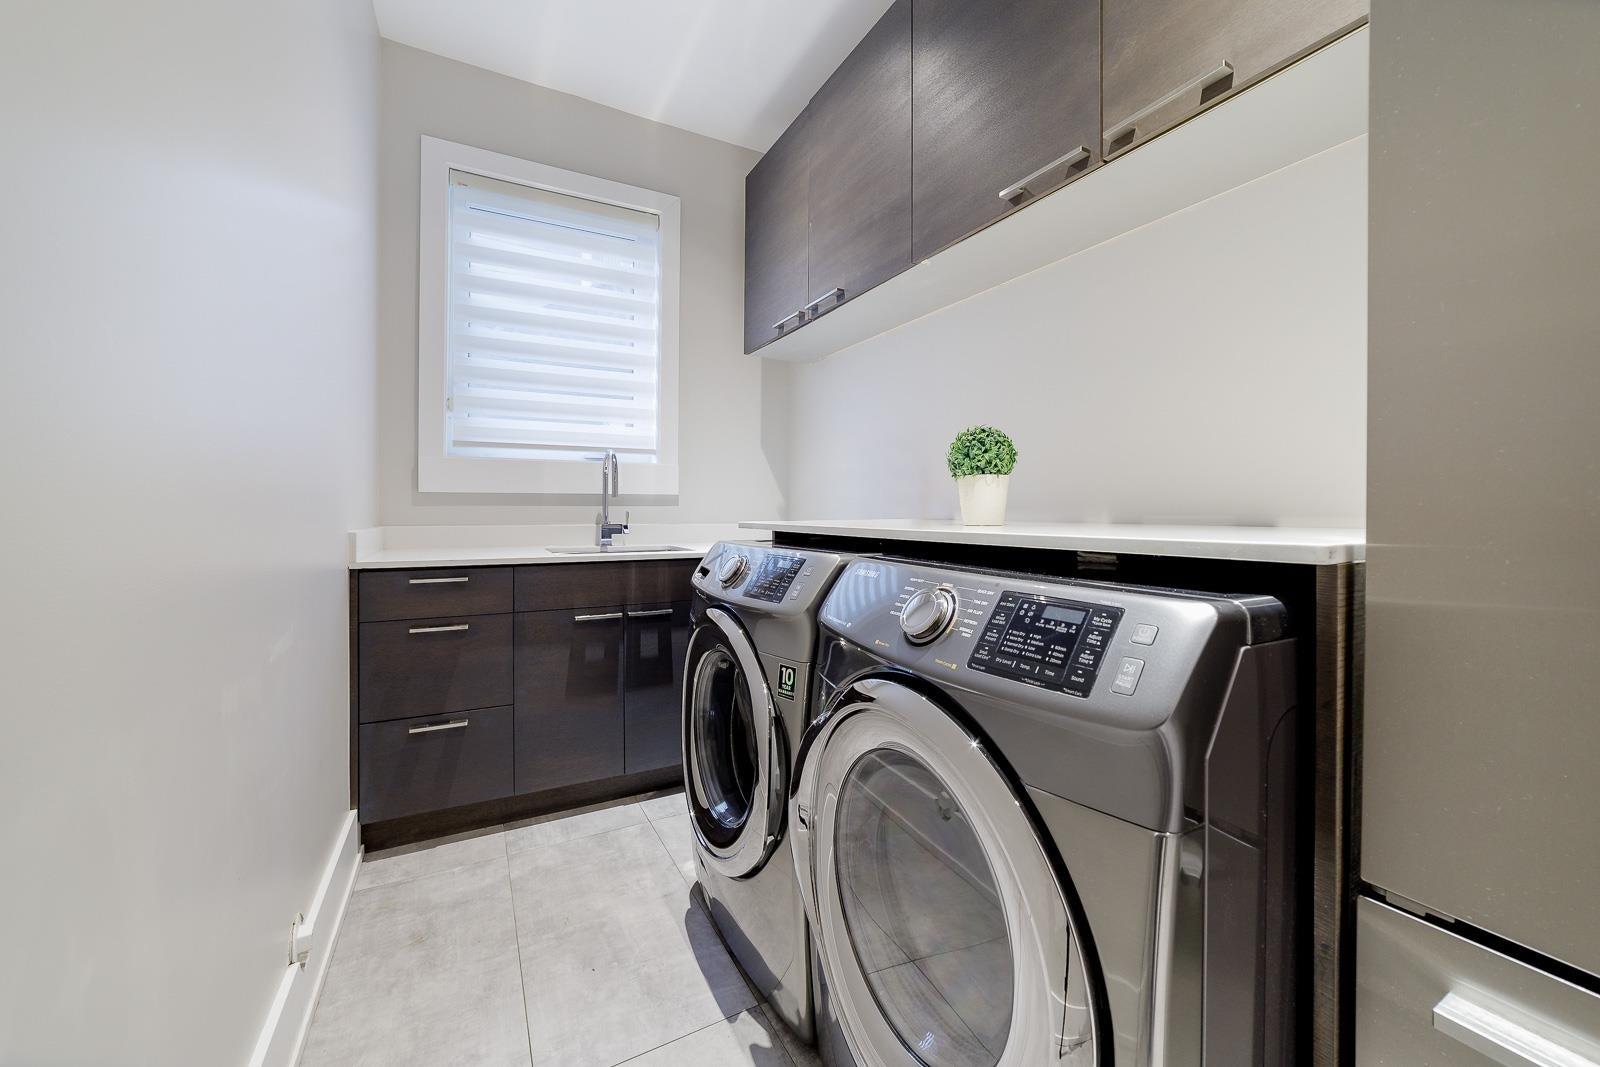 517 GRANADA CRESCENT - Upper Delbrook House/Single Family for sale, 8 Bedrooms (R2615057) - #13